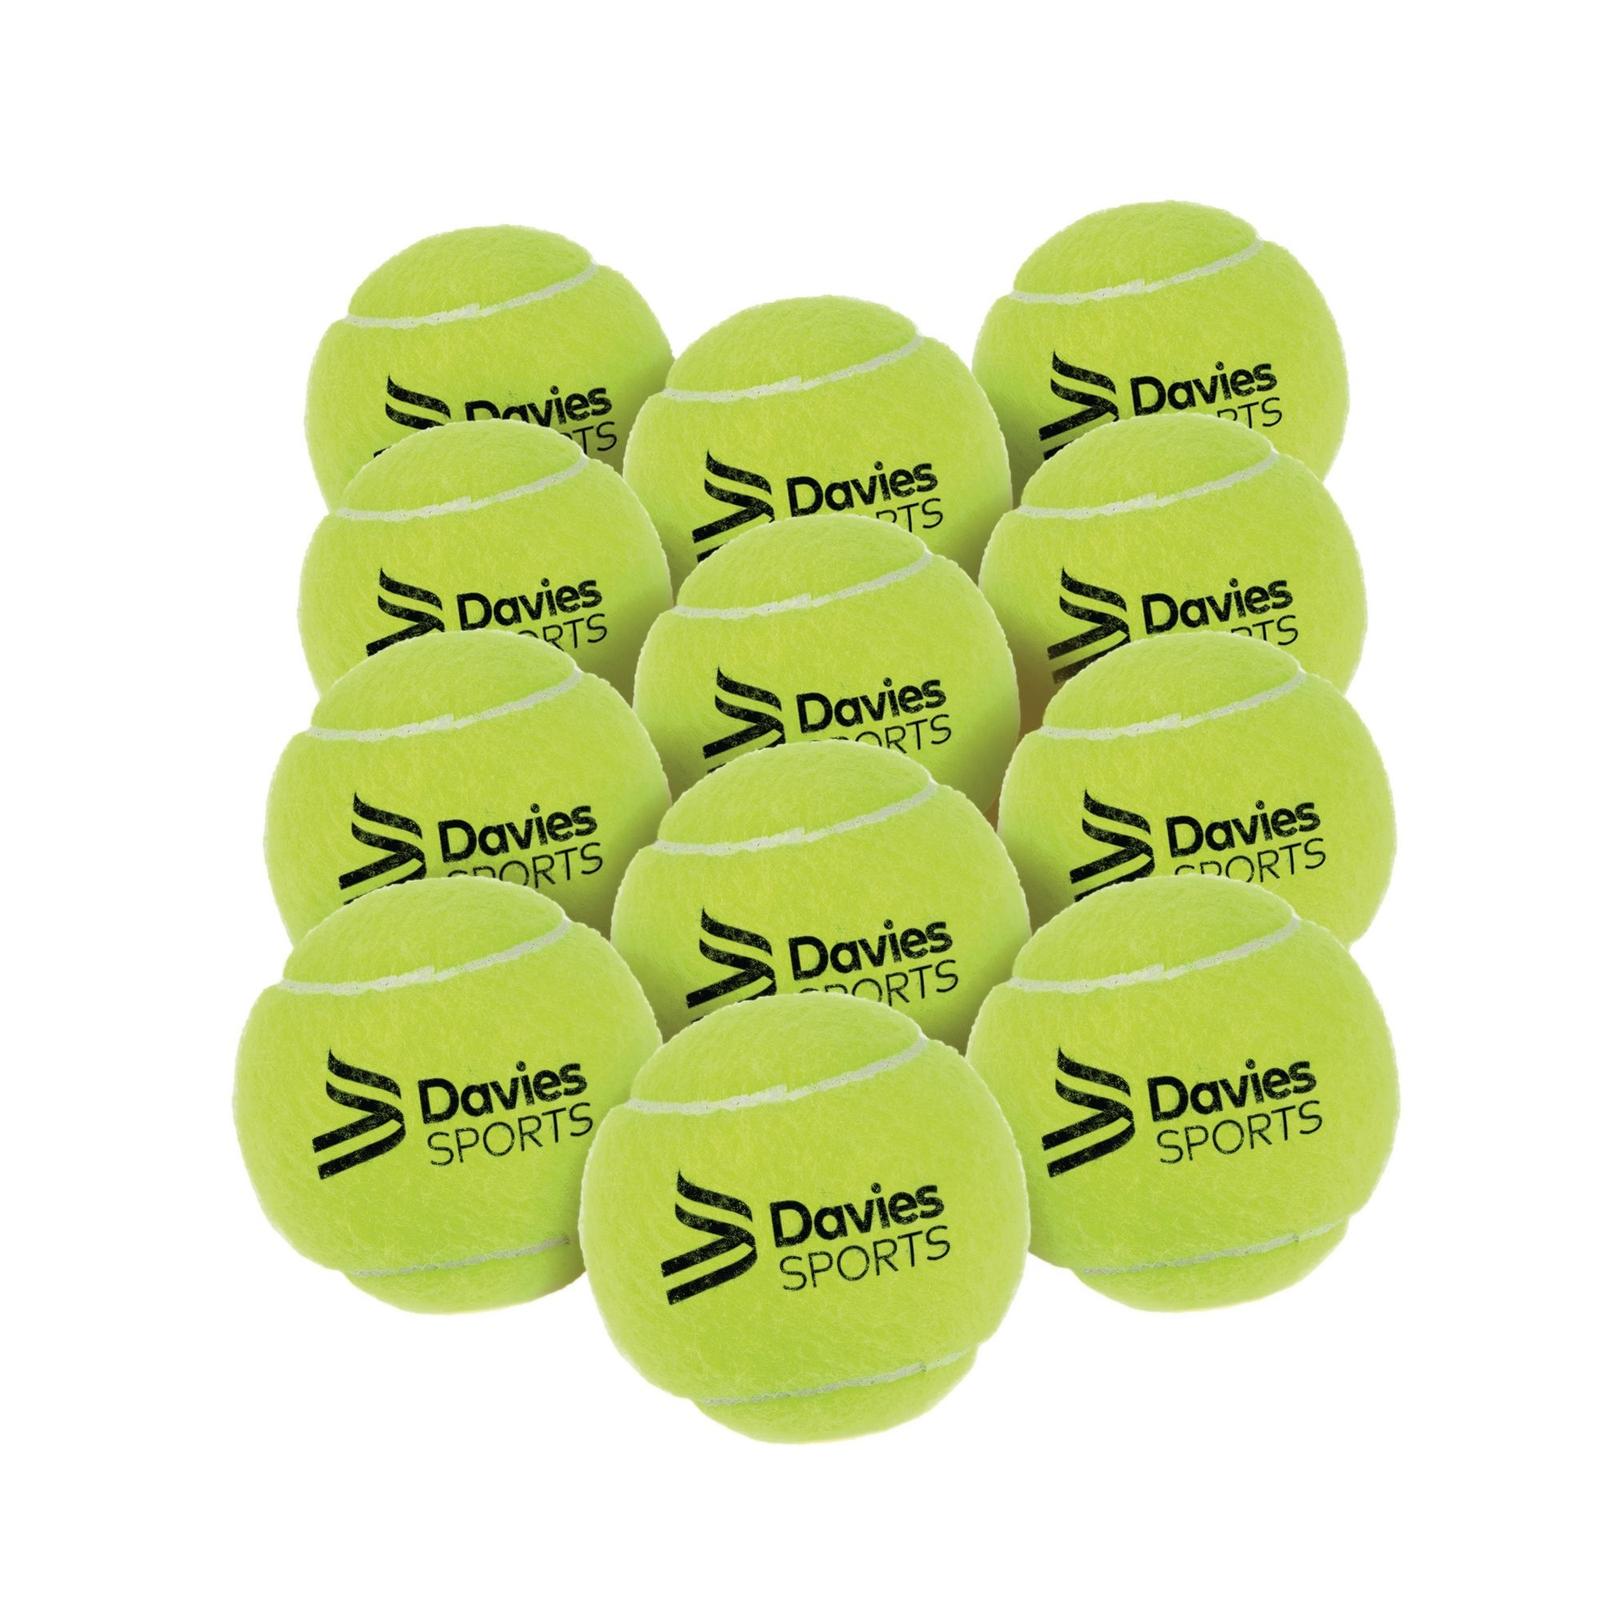 Davies Sports Practice Tennis Balls - Pack of 12